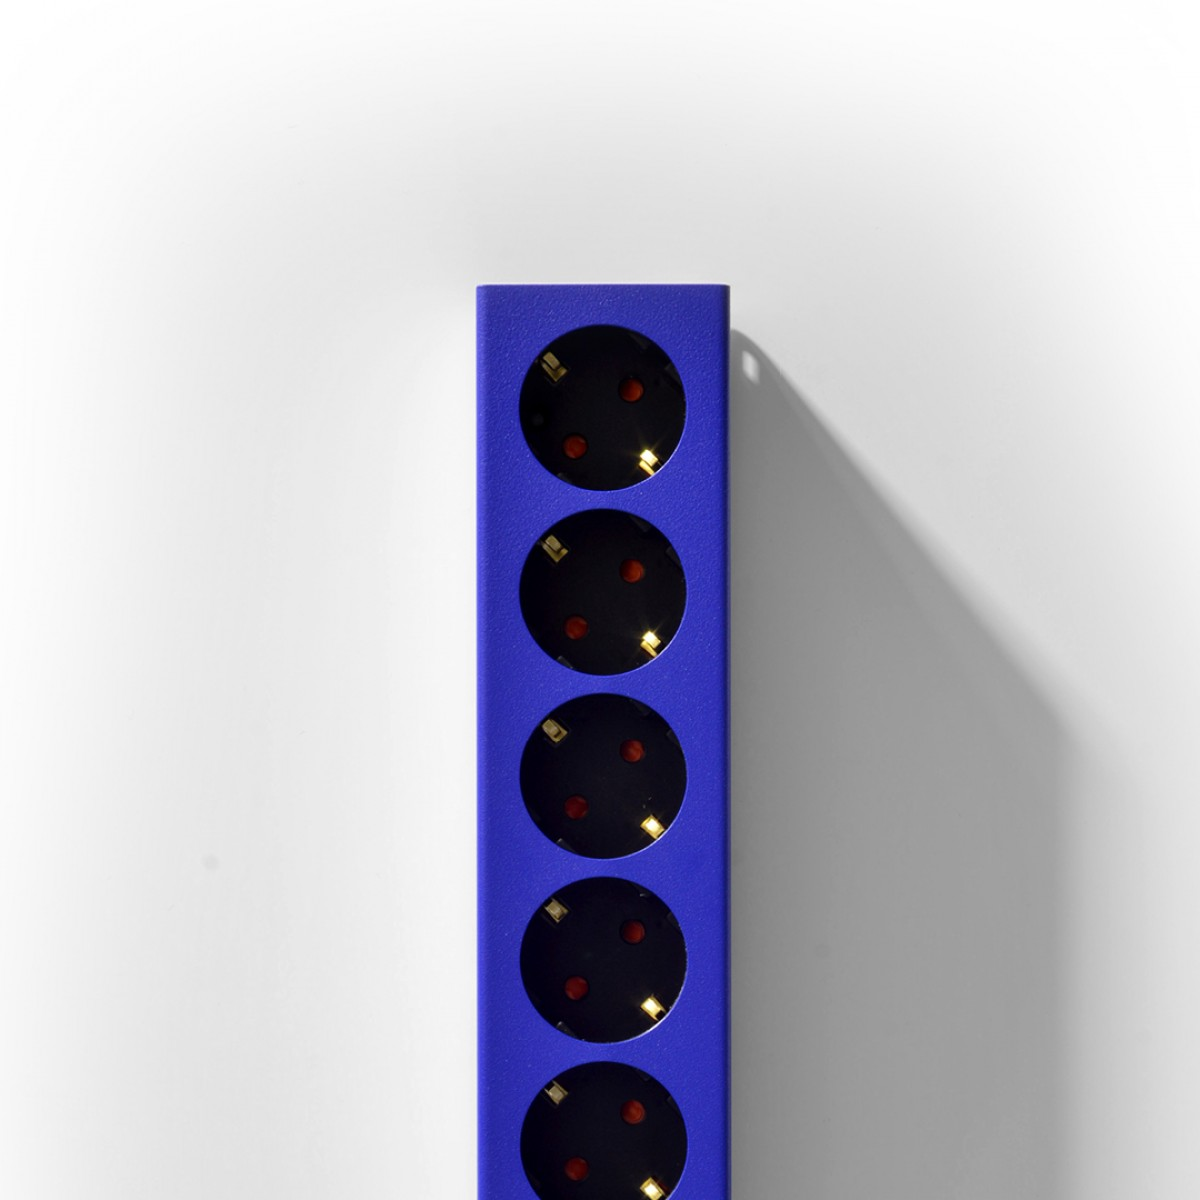 PEPPERMINT PRODUCTS Mehrfachstecker aus Stahl 6er